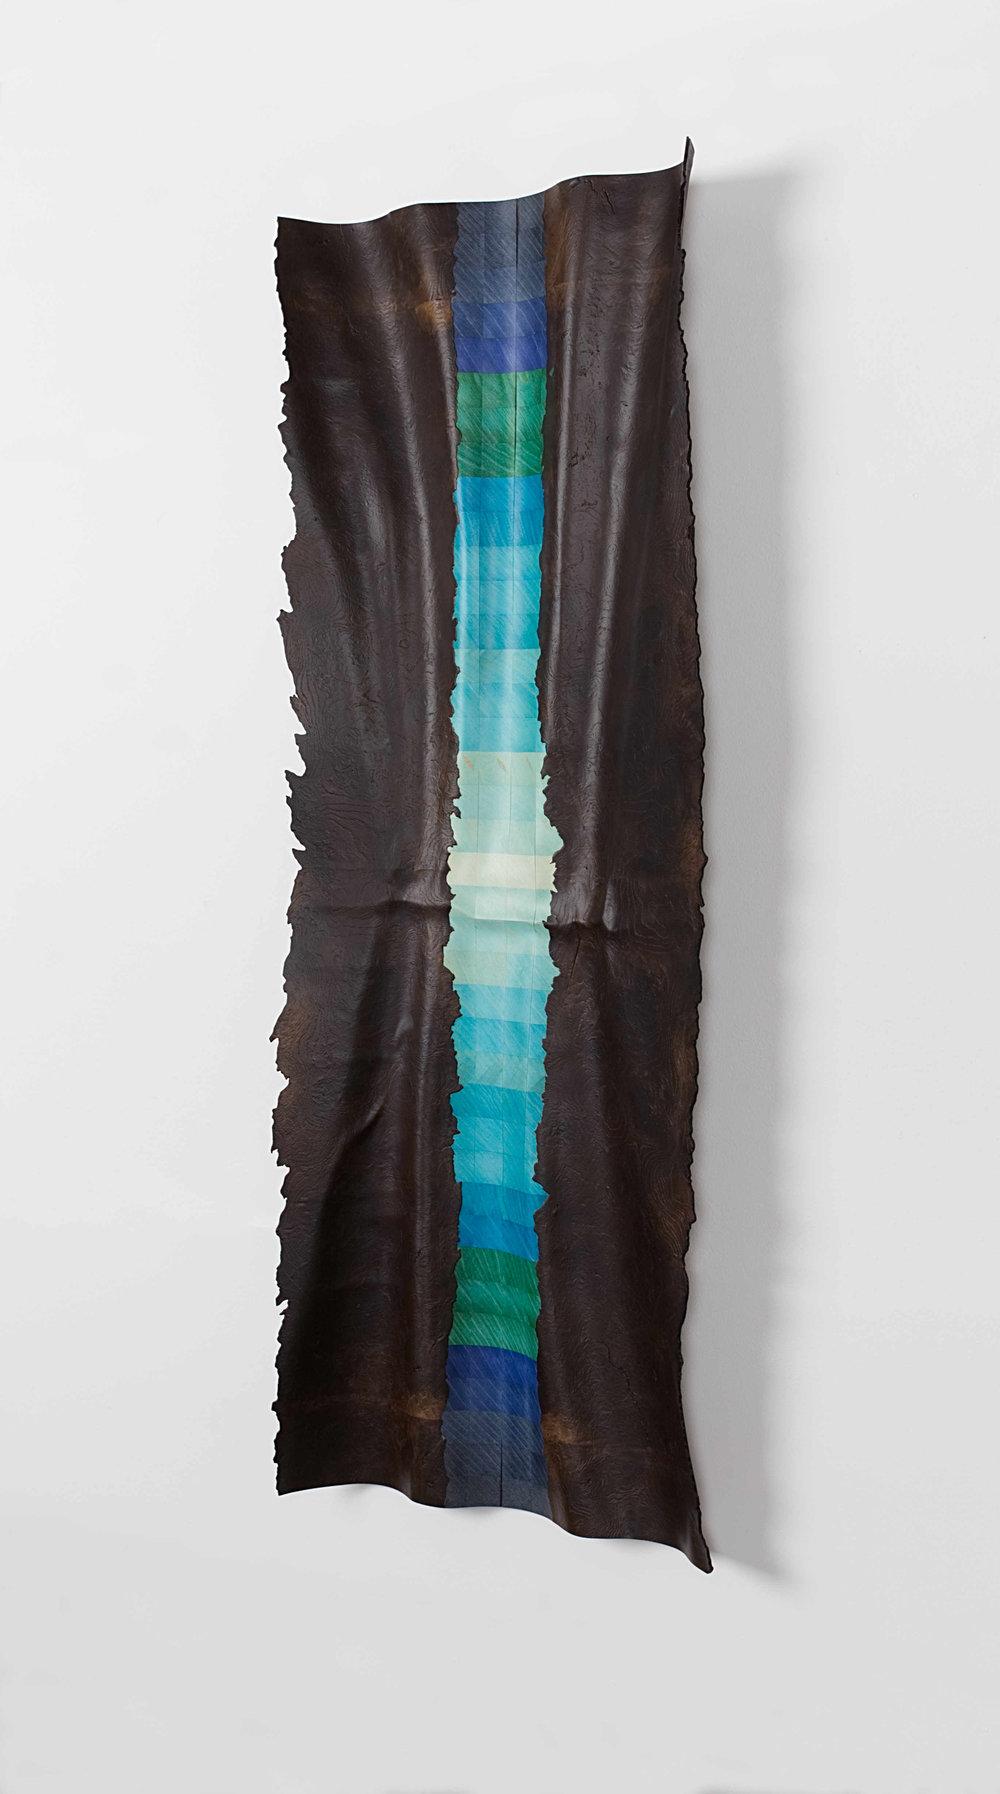 Aqua 2 2 118x41x3cm Kevin Stamper.jpg